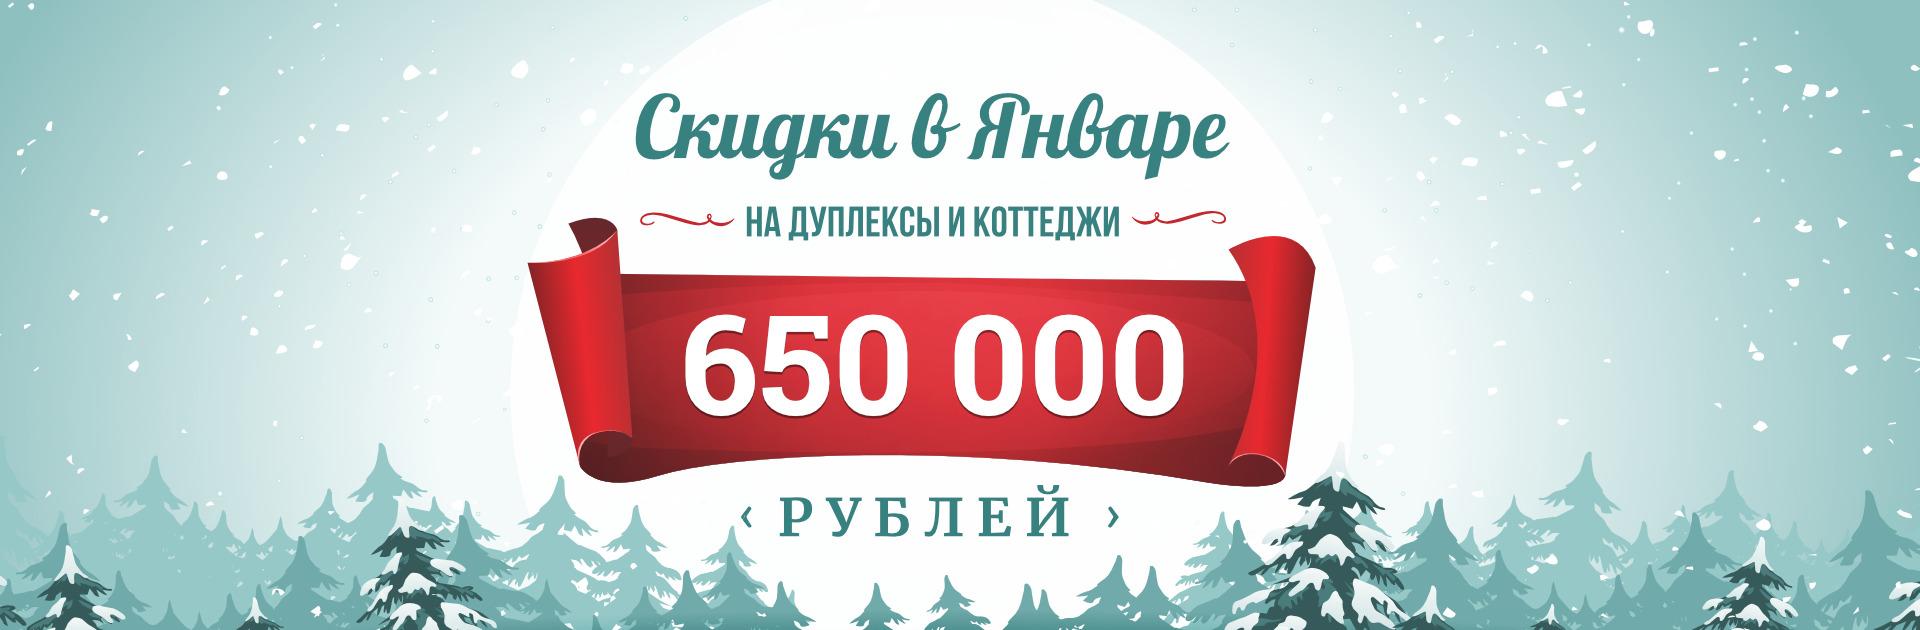 АКЦИЯ 2020 - ЯНВАРСКИЕ СКИДКИ! | КП Варежки 3